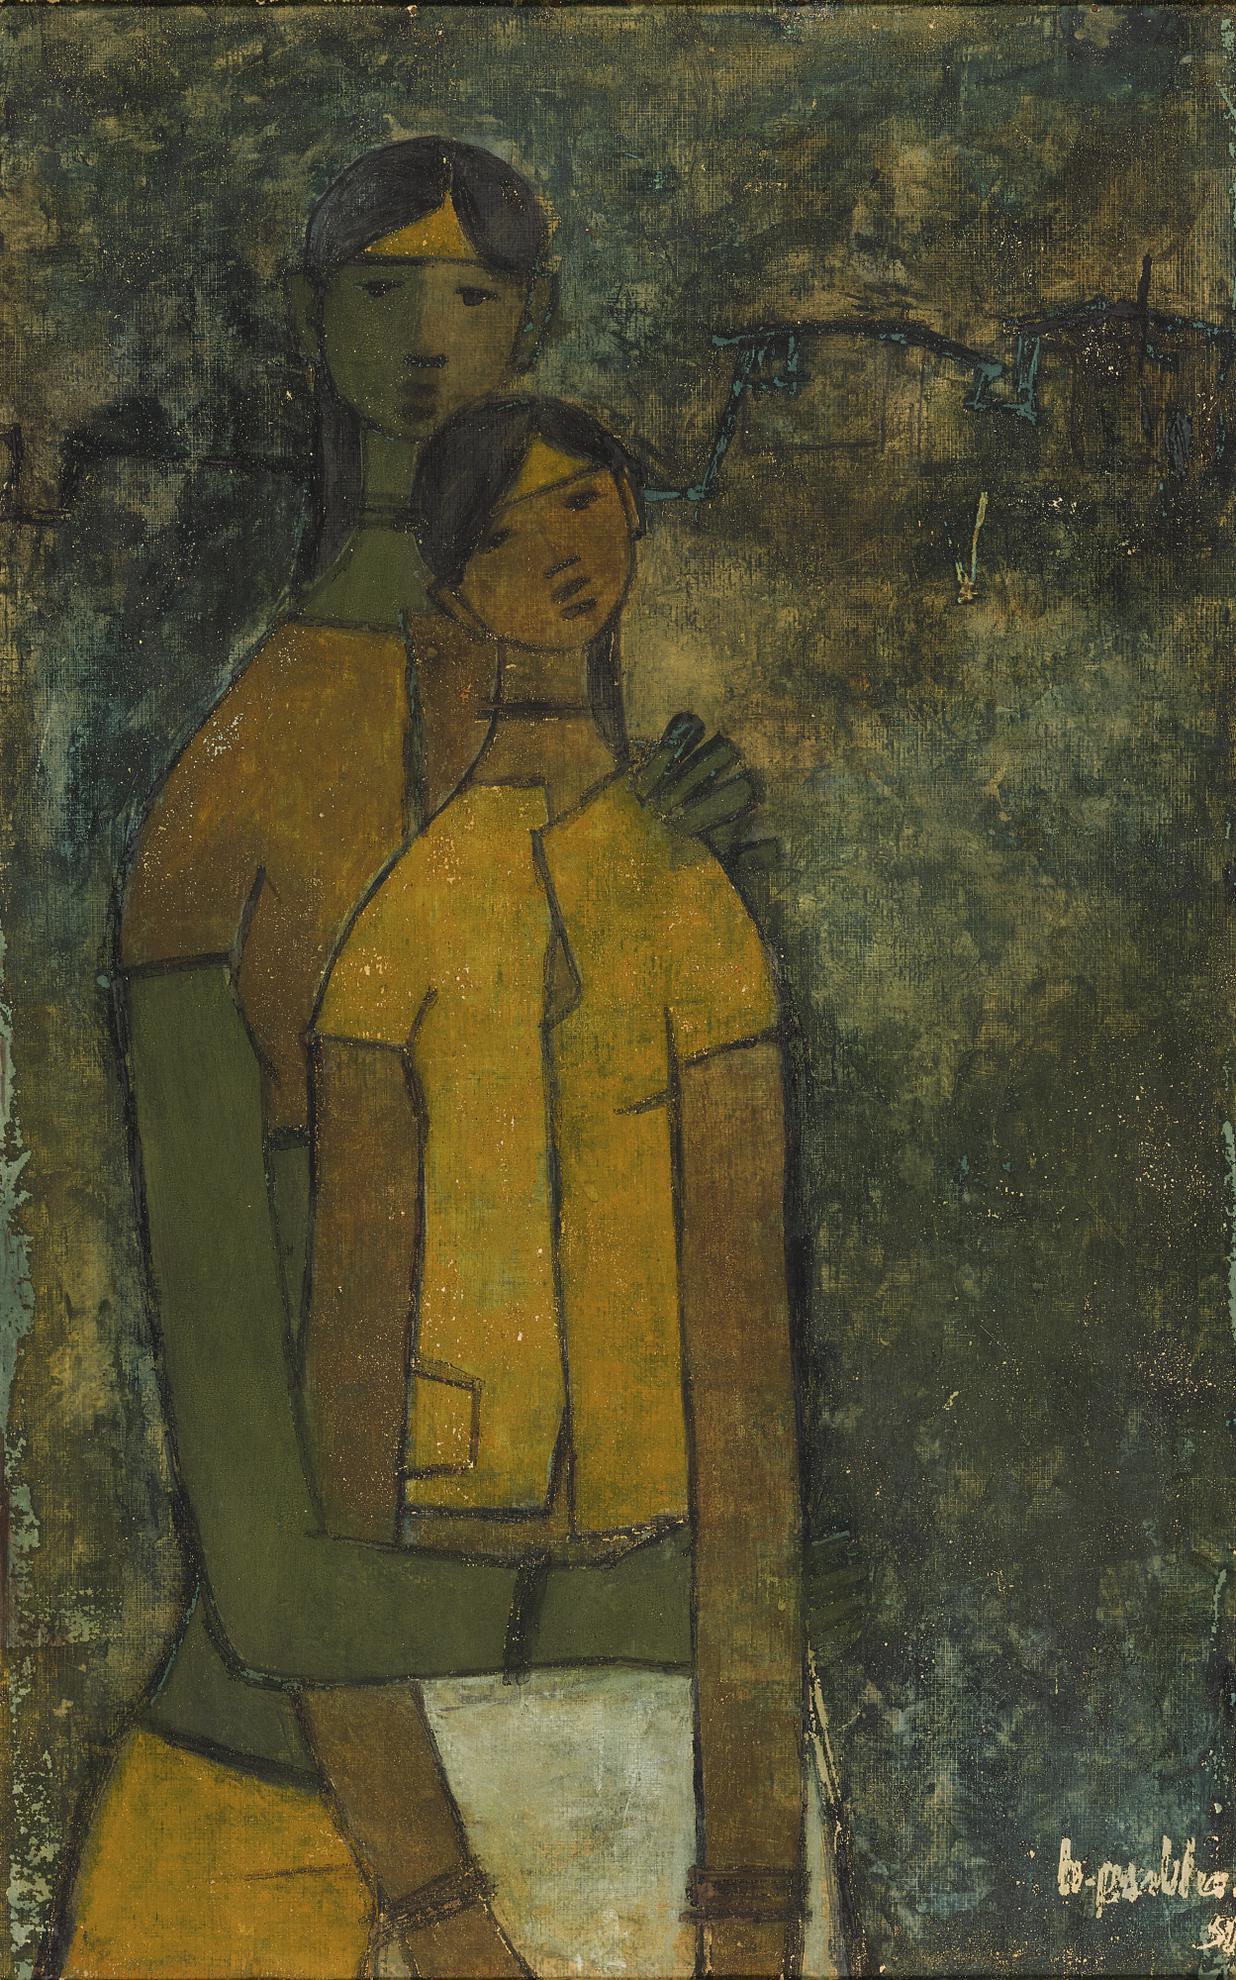 B. Prabha-Untitled (Two Women)-1959